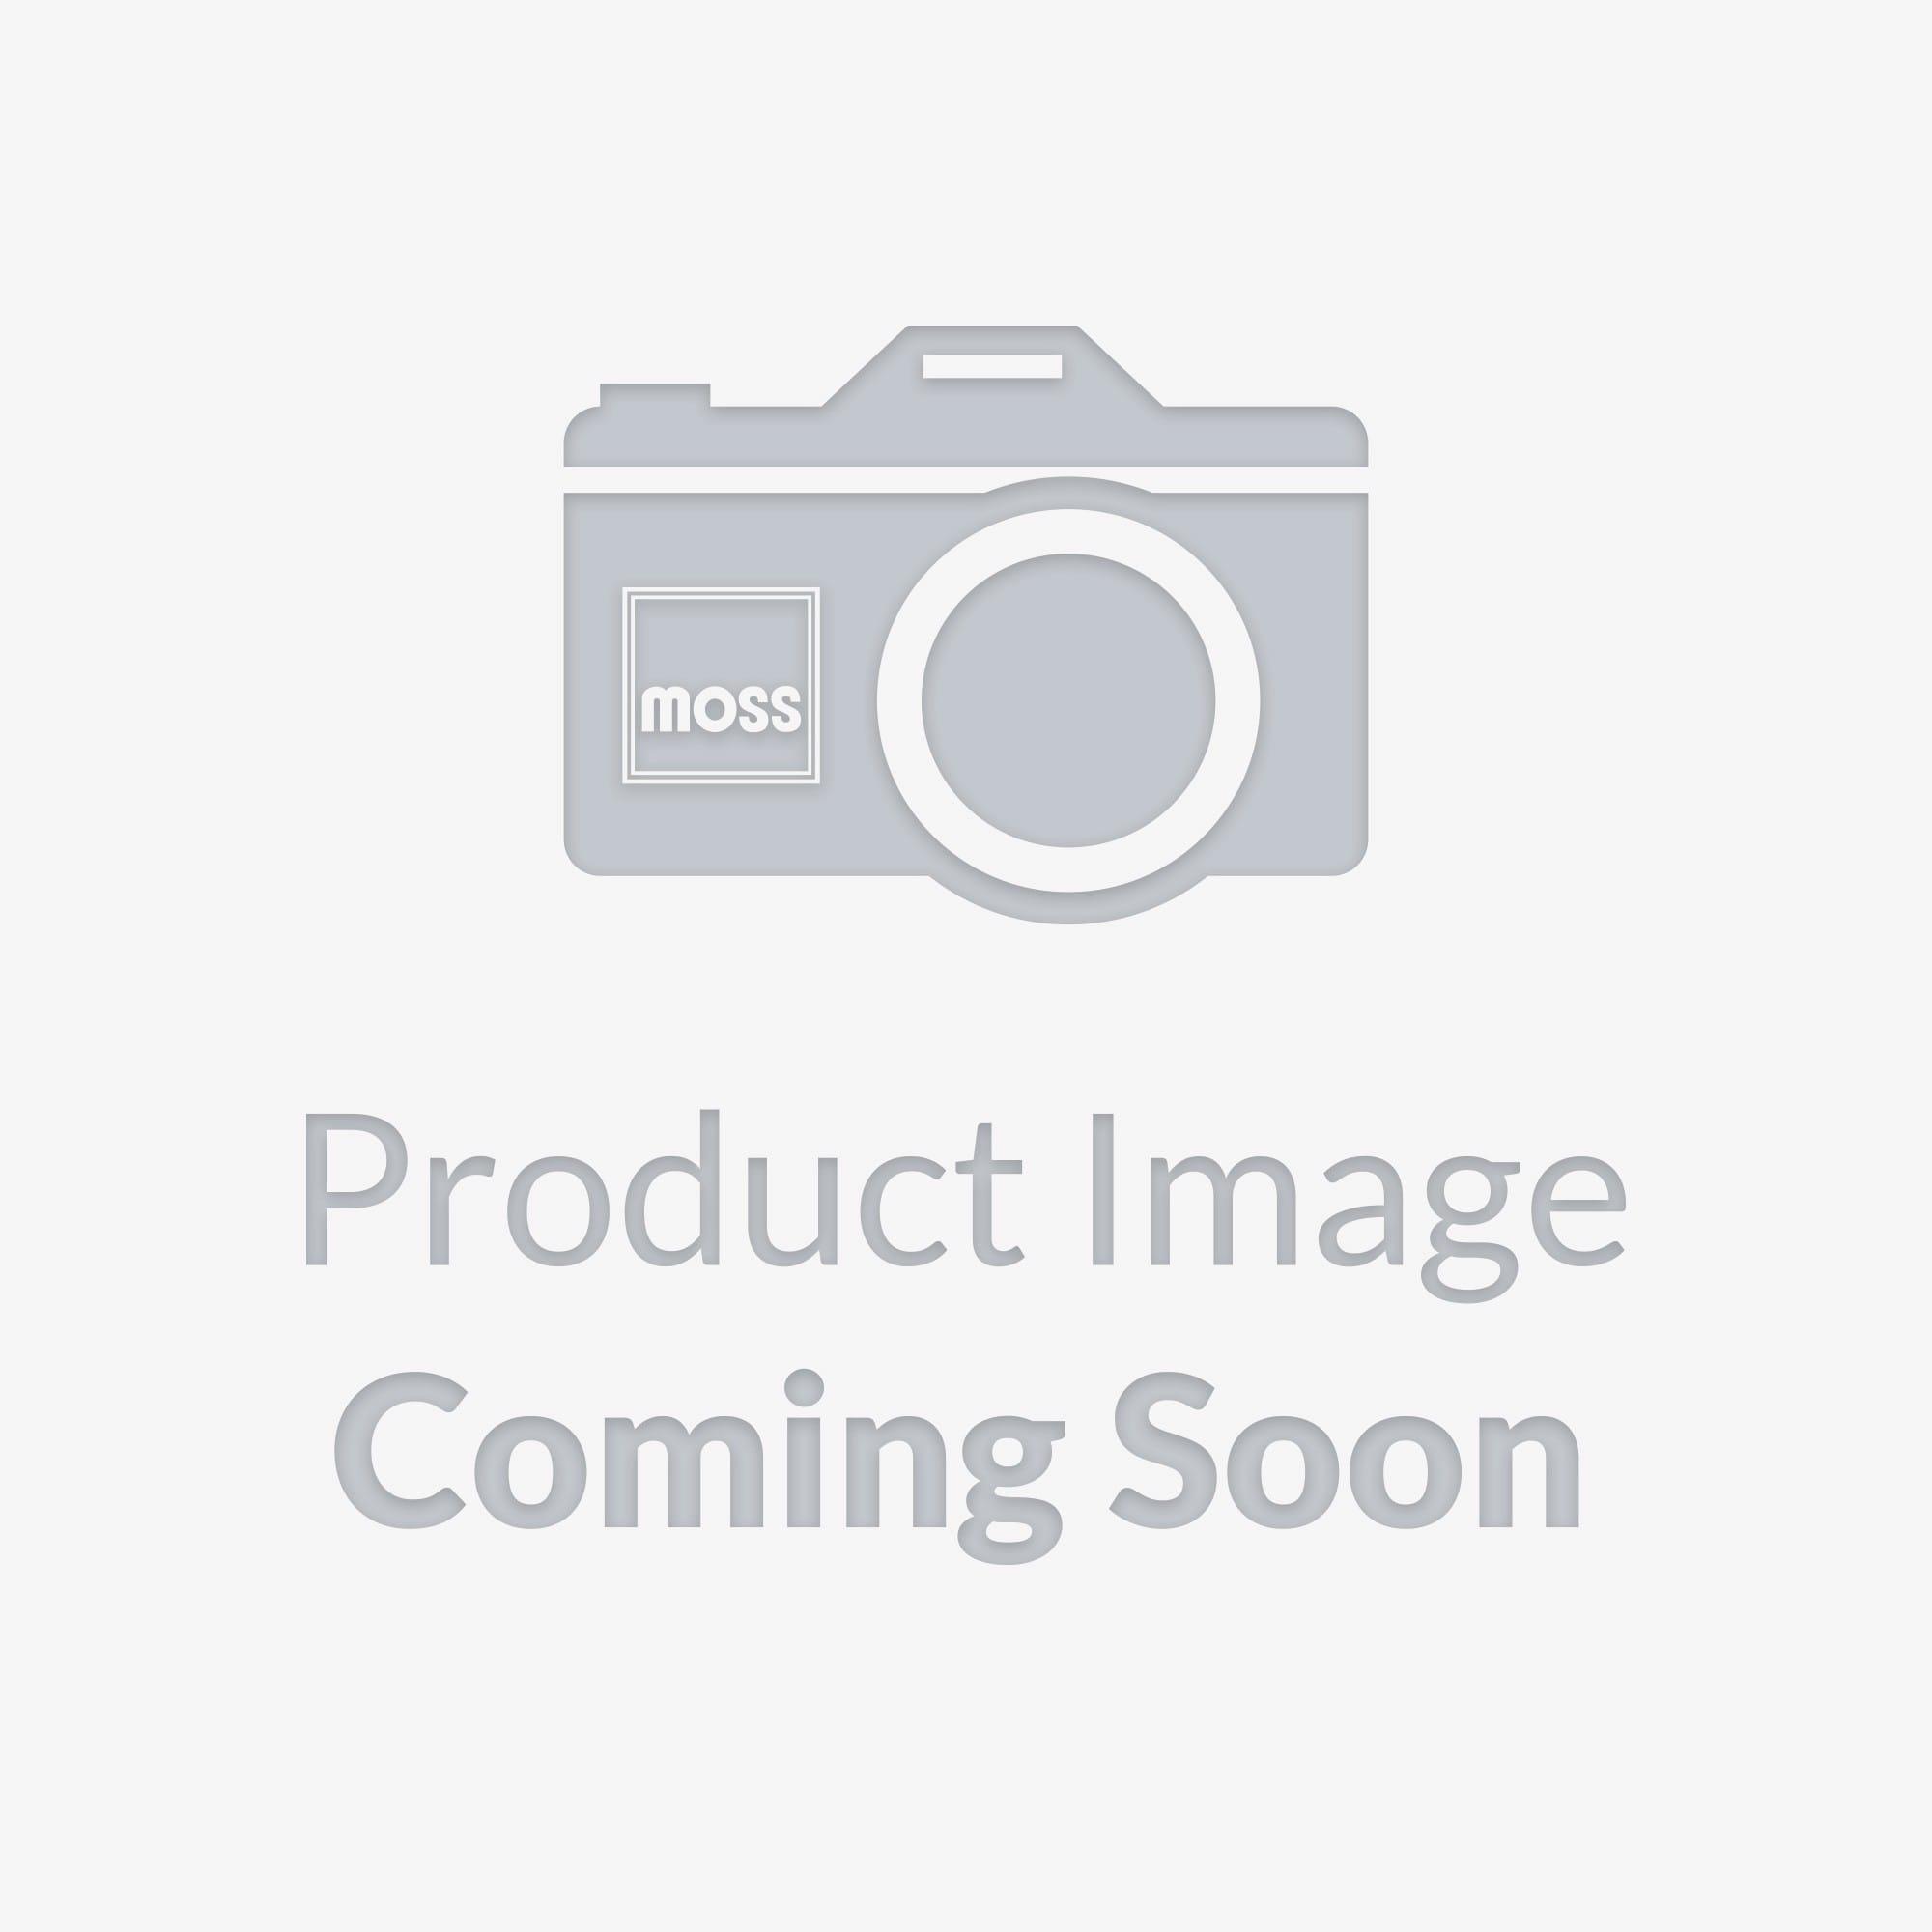 Eaton Supercharger Miata: Engine & Performance